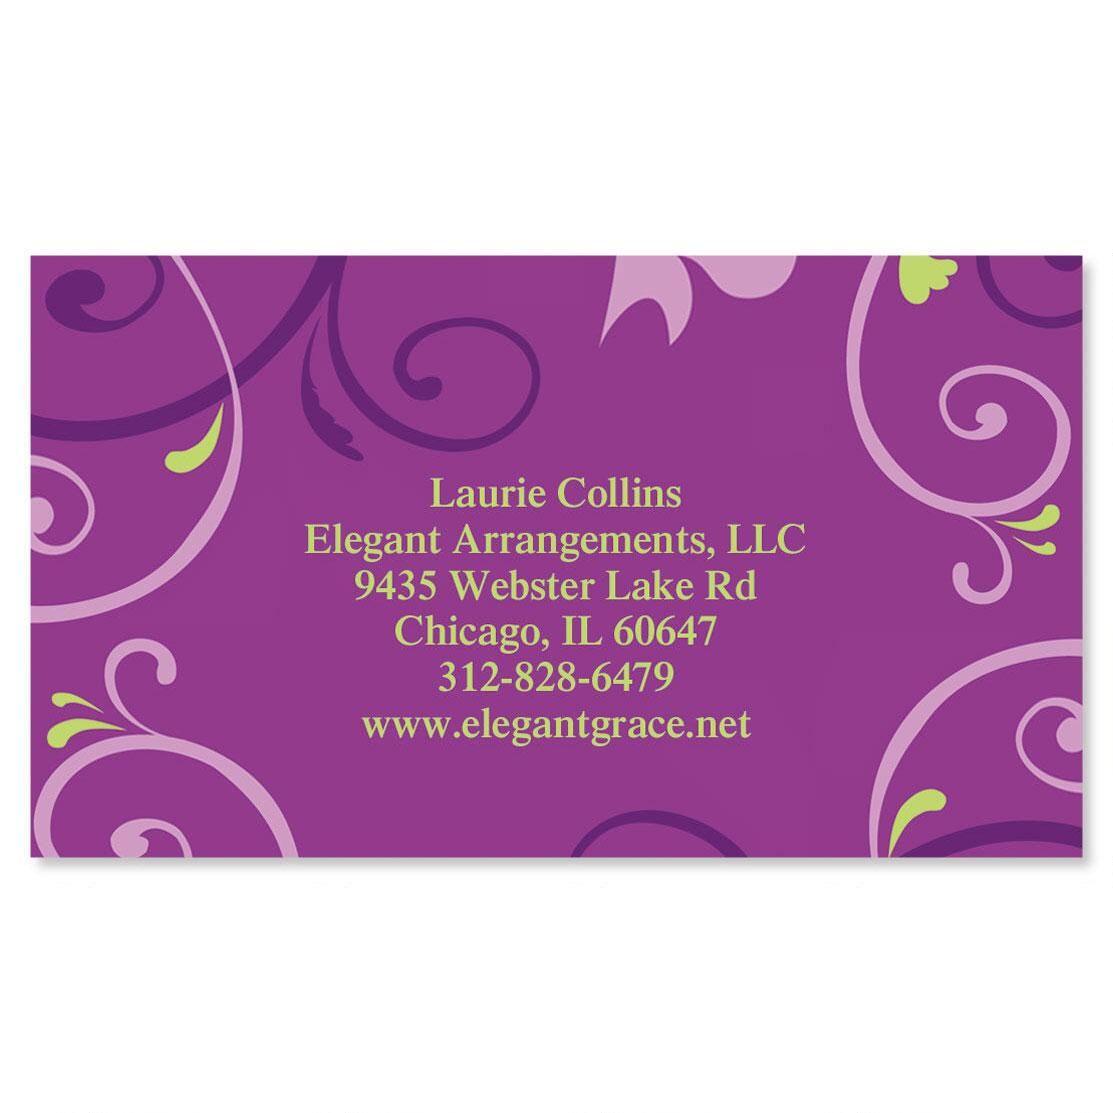 Gracious Business Cards